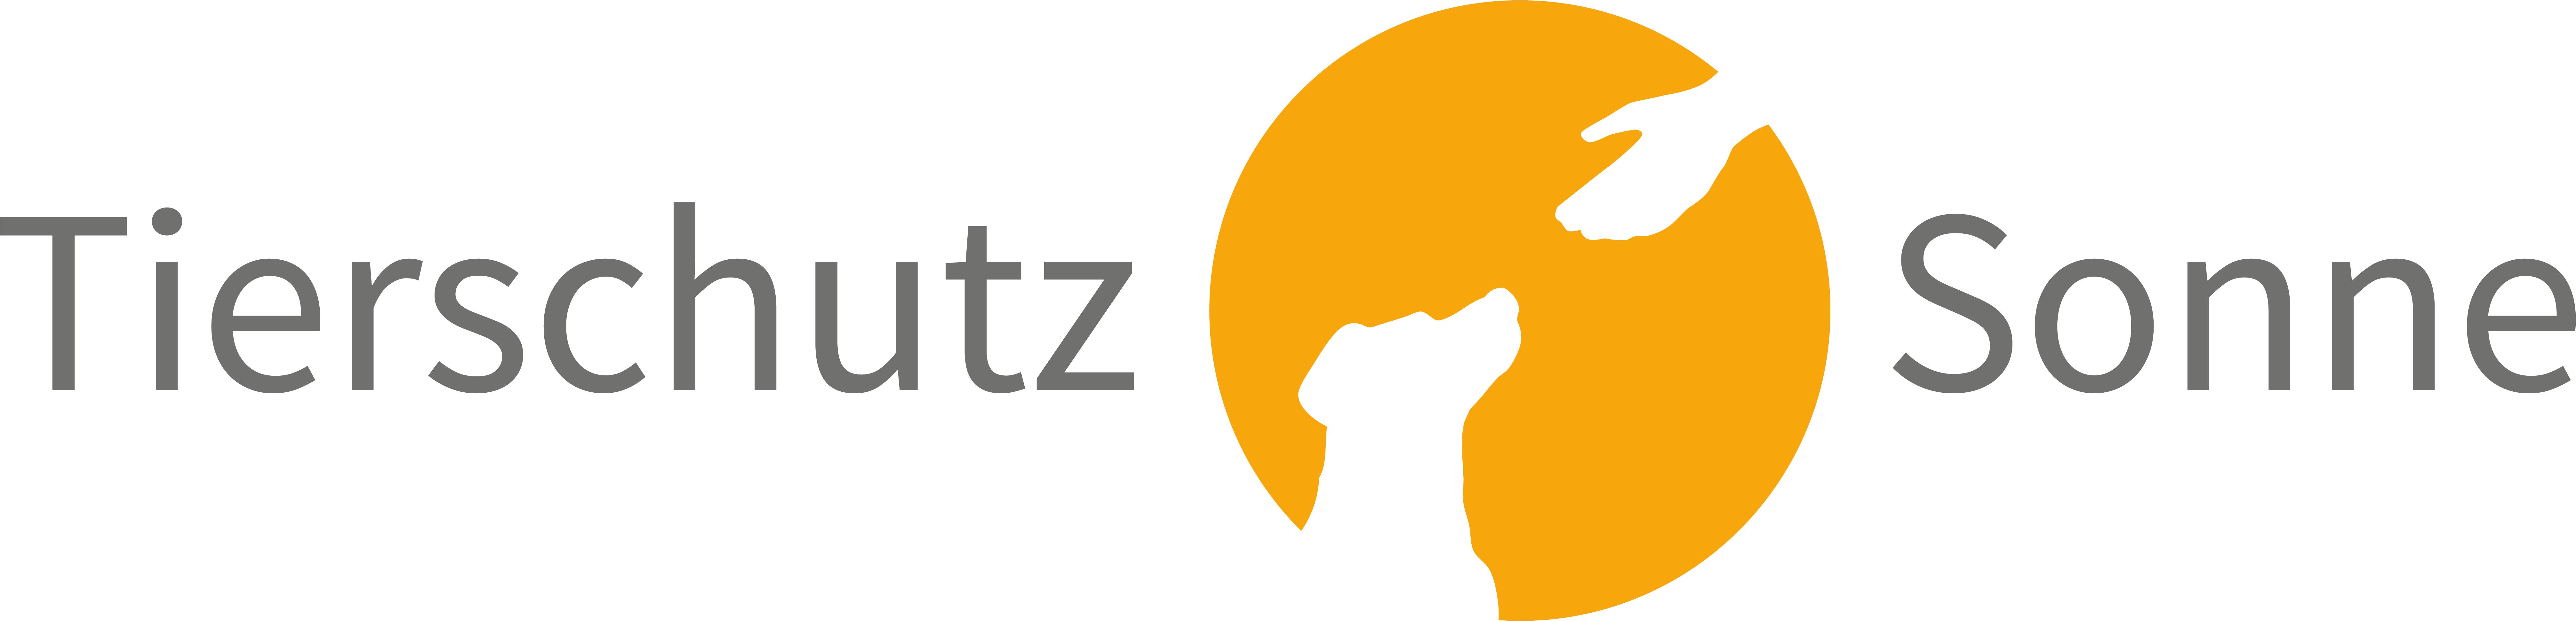 Tierschutz Sonne Logo_CMYK_(Orig)